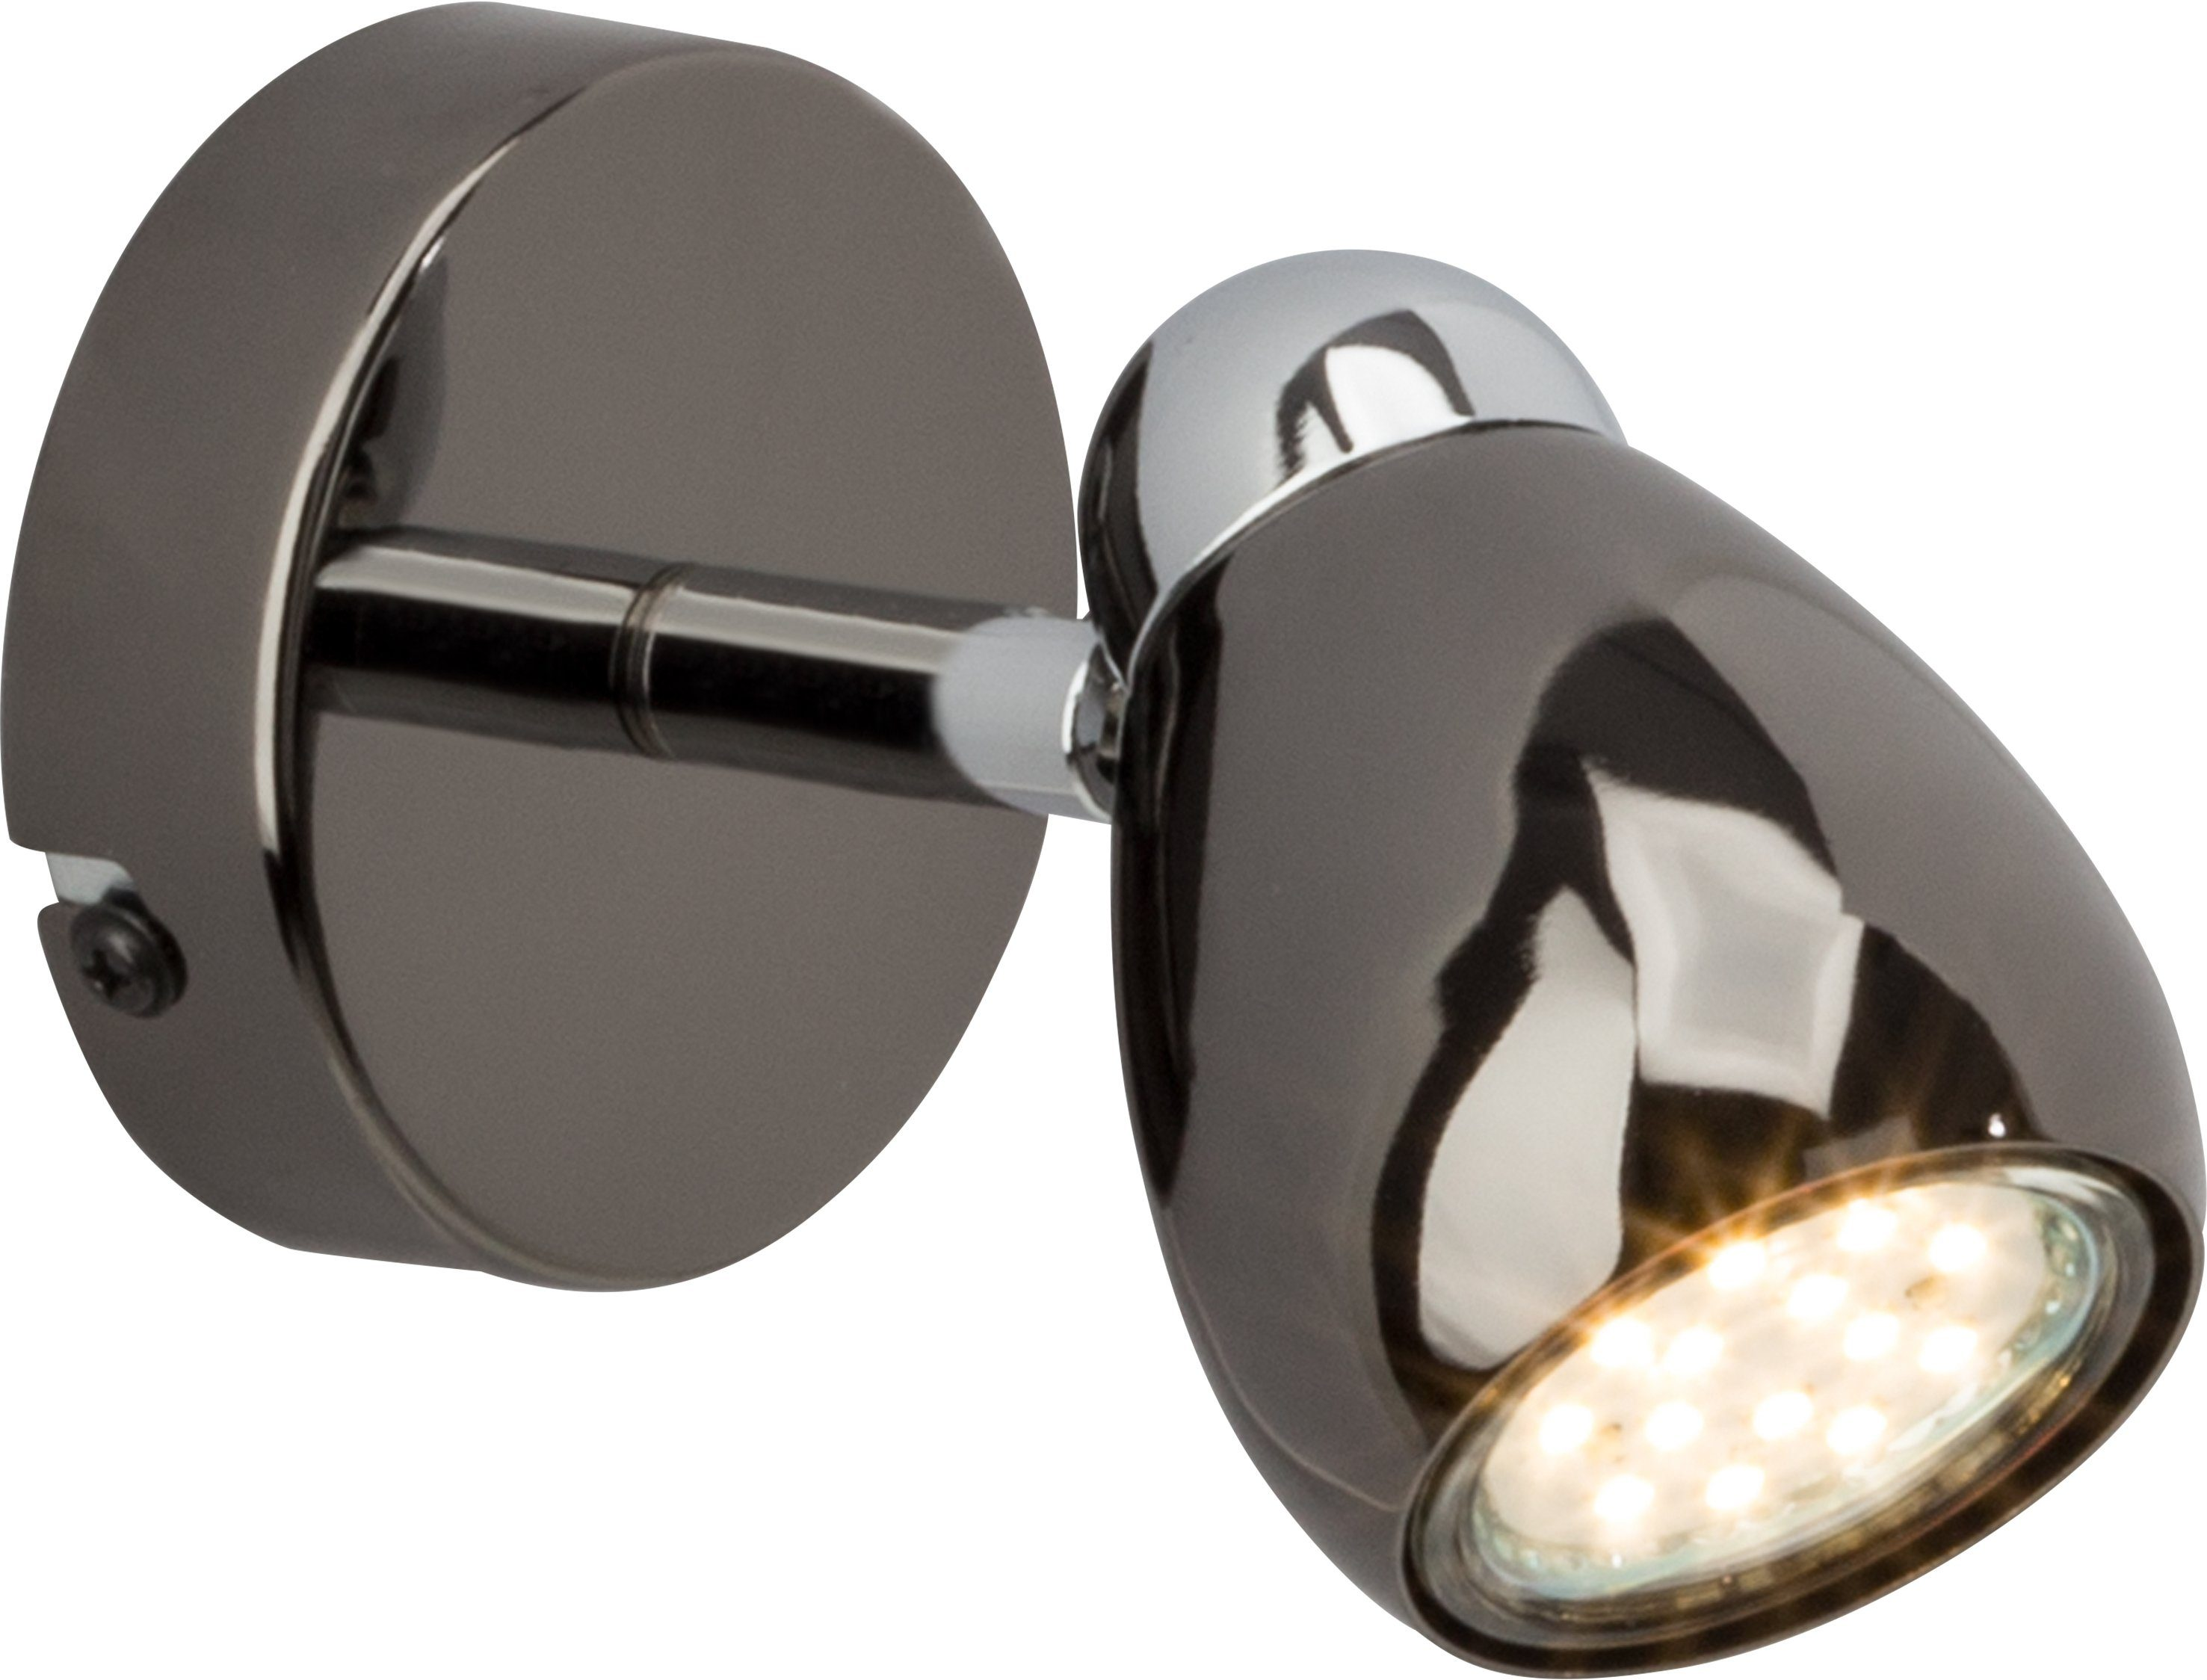 Brilliant Leuchten LED Wandleuchte, 1flg., »Milano«